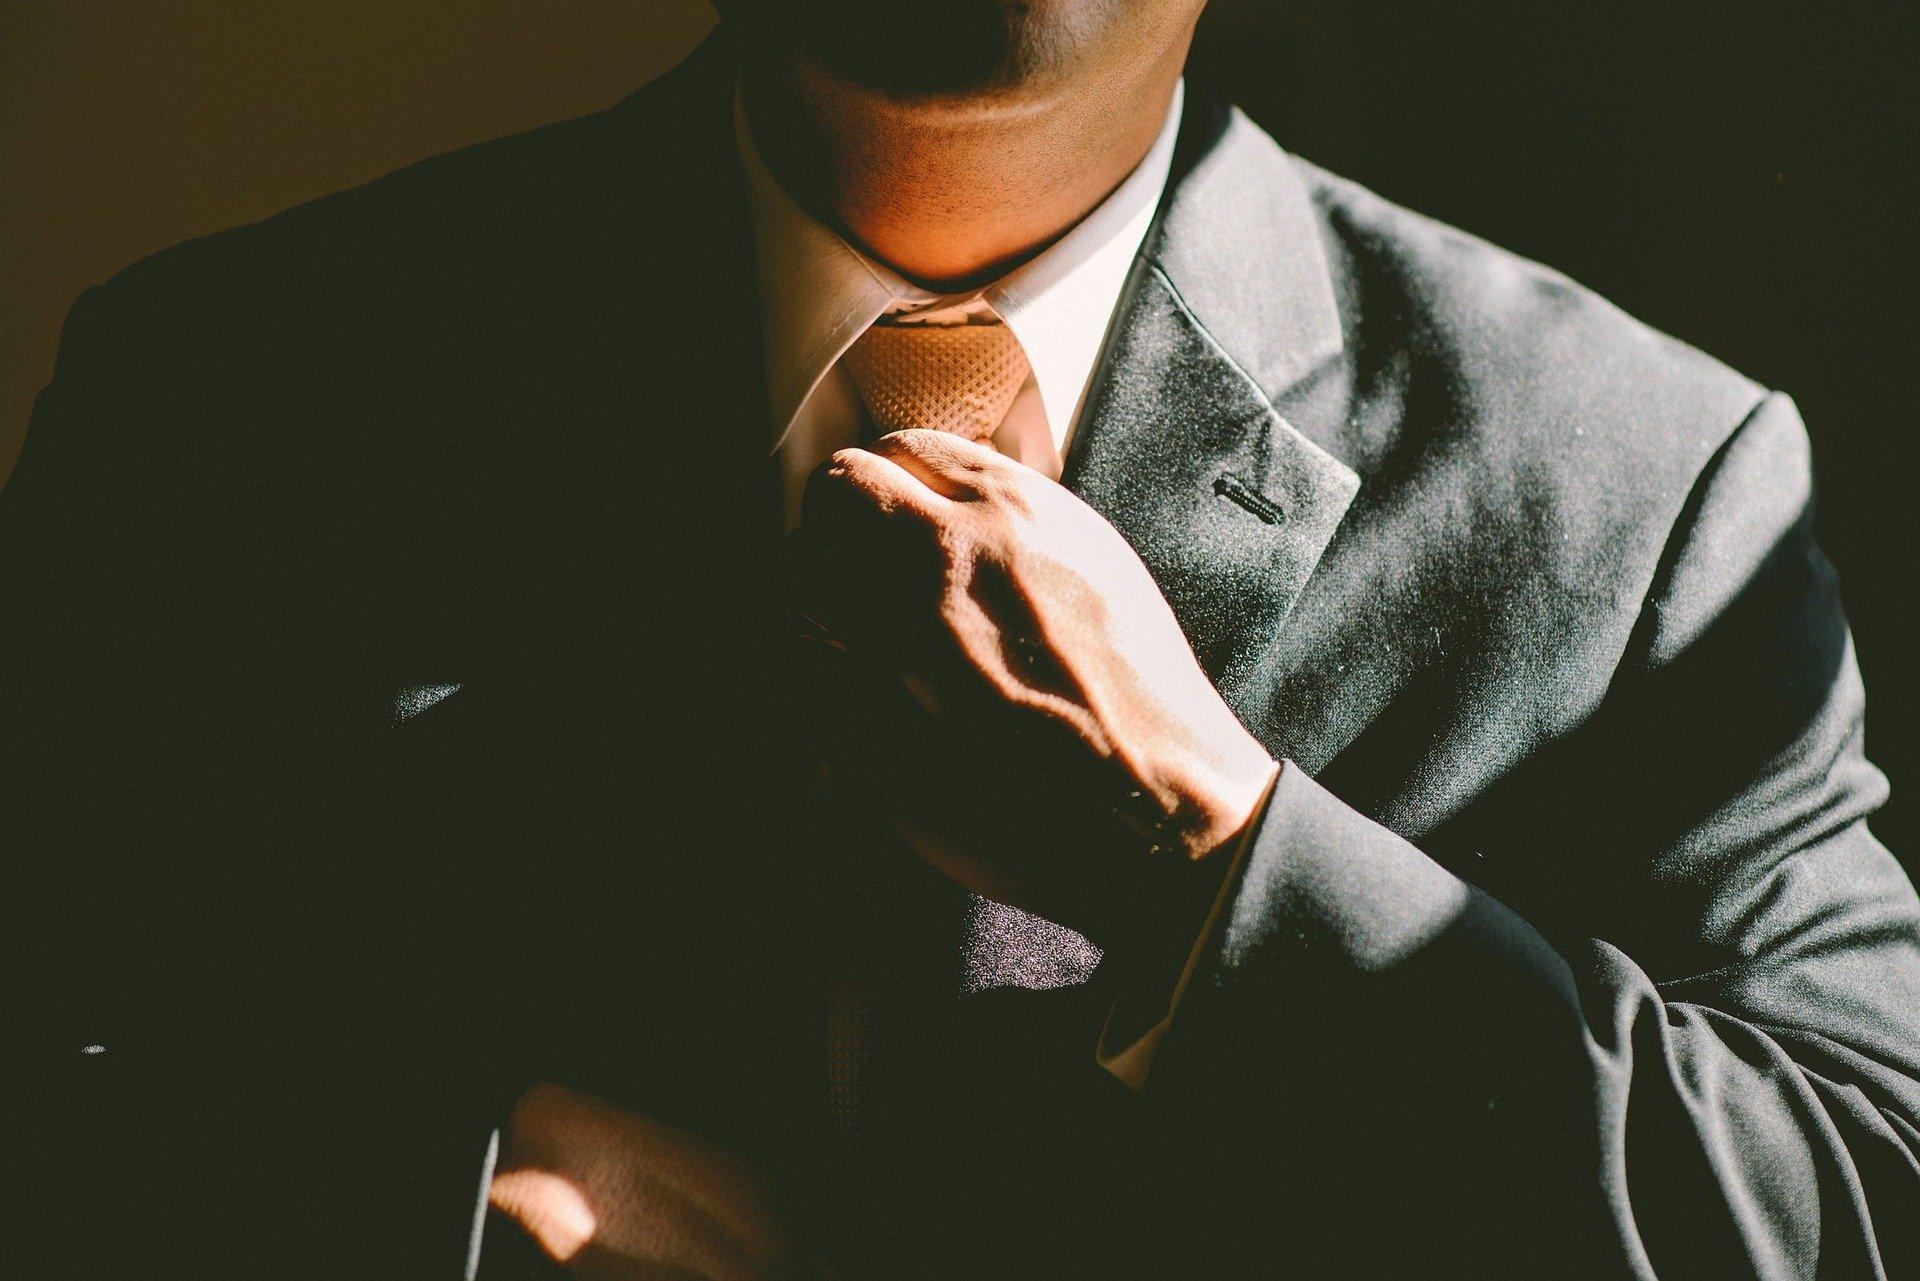 Even a Business Leader Needs Help